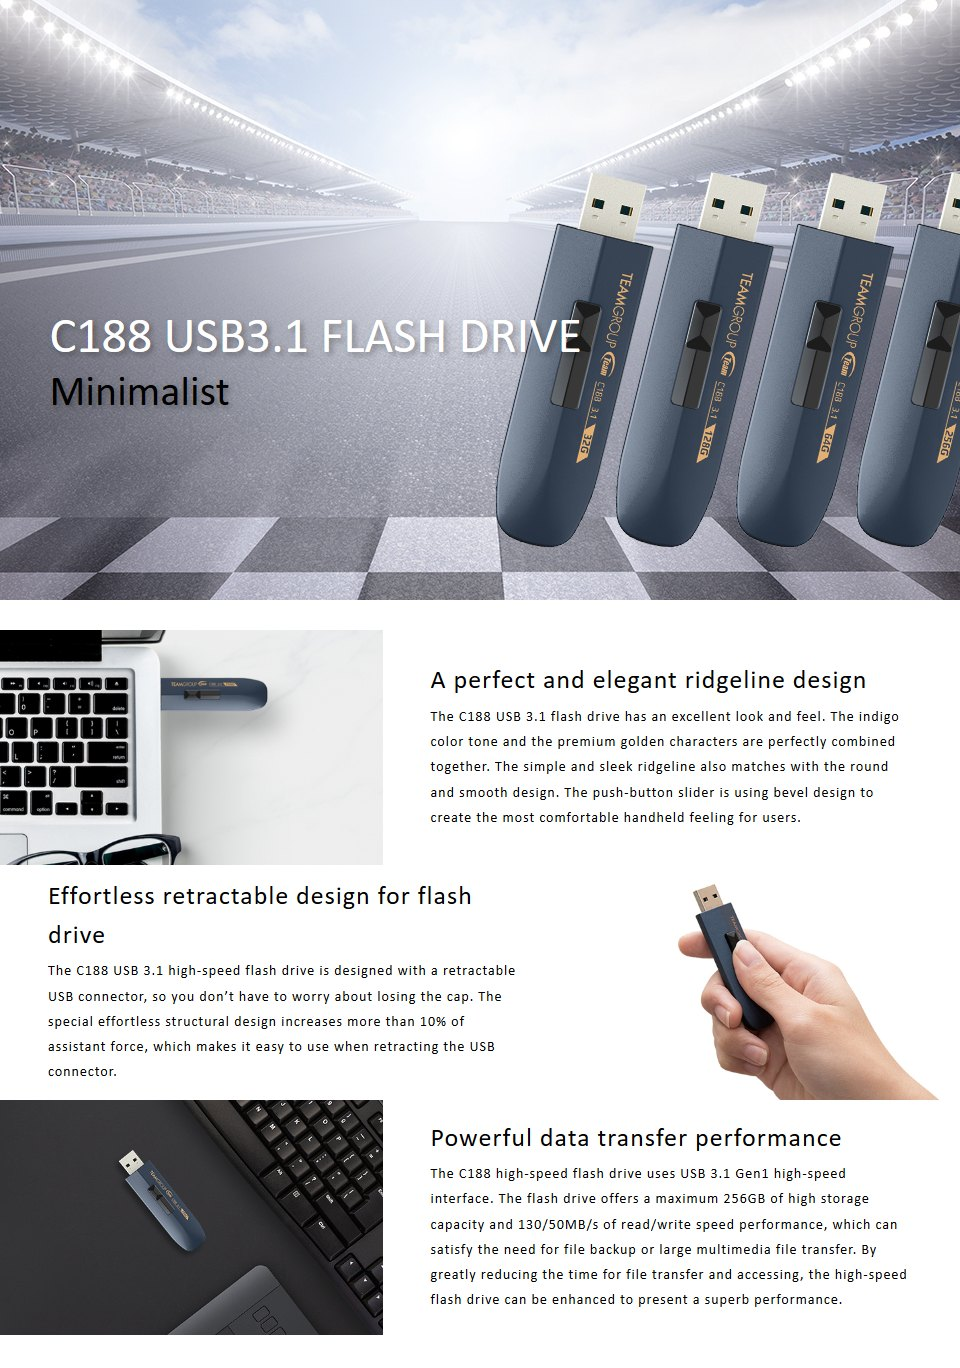 Team Group C188 USB 3.1 Flash Drive 256GB Indigo features